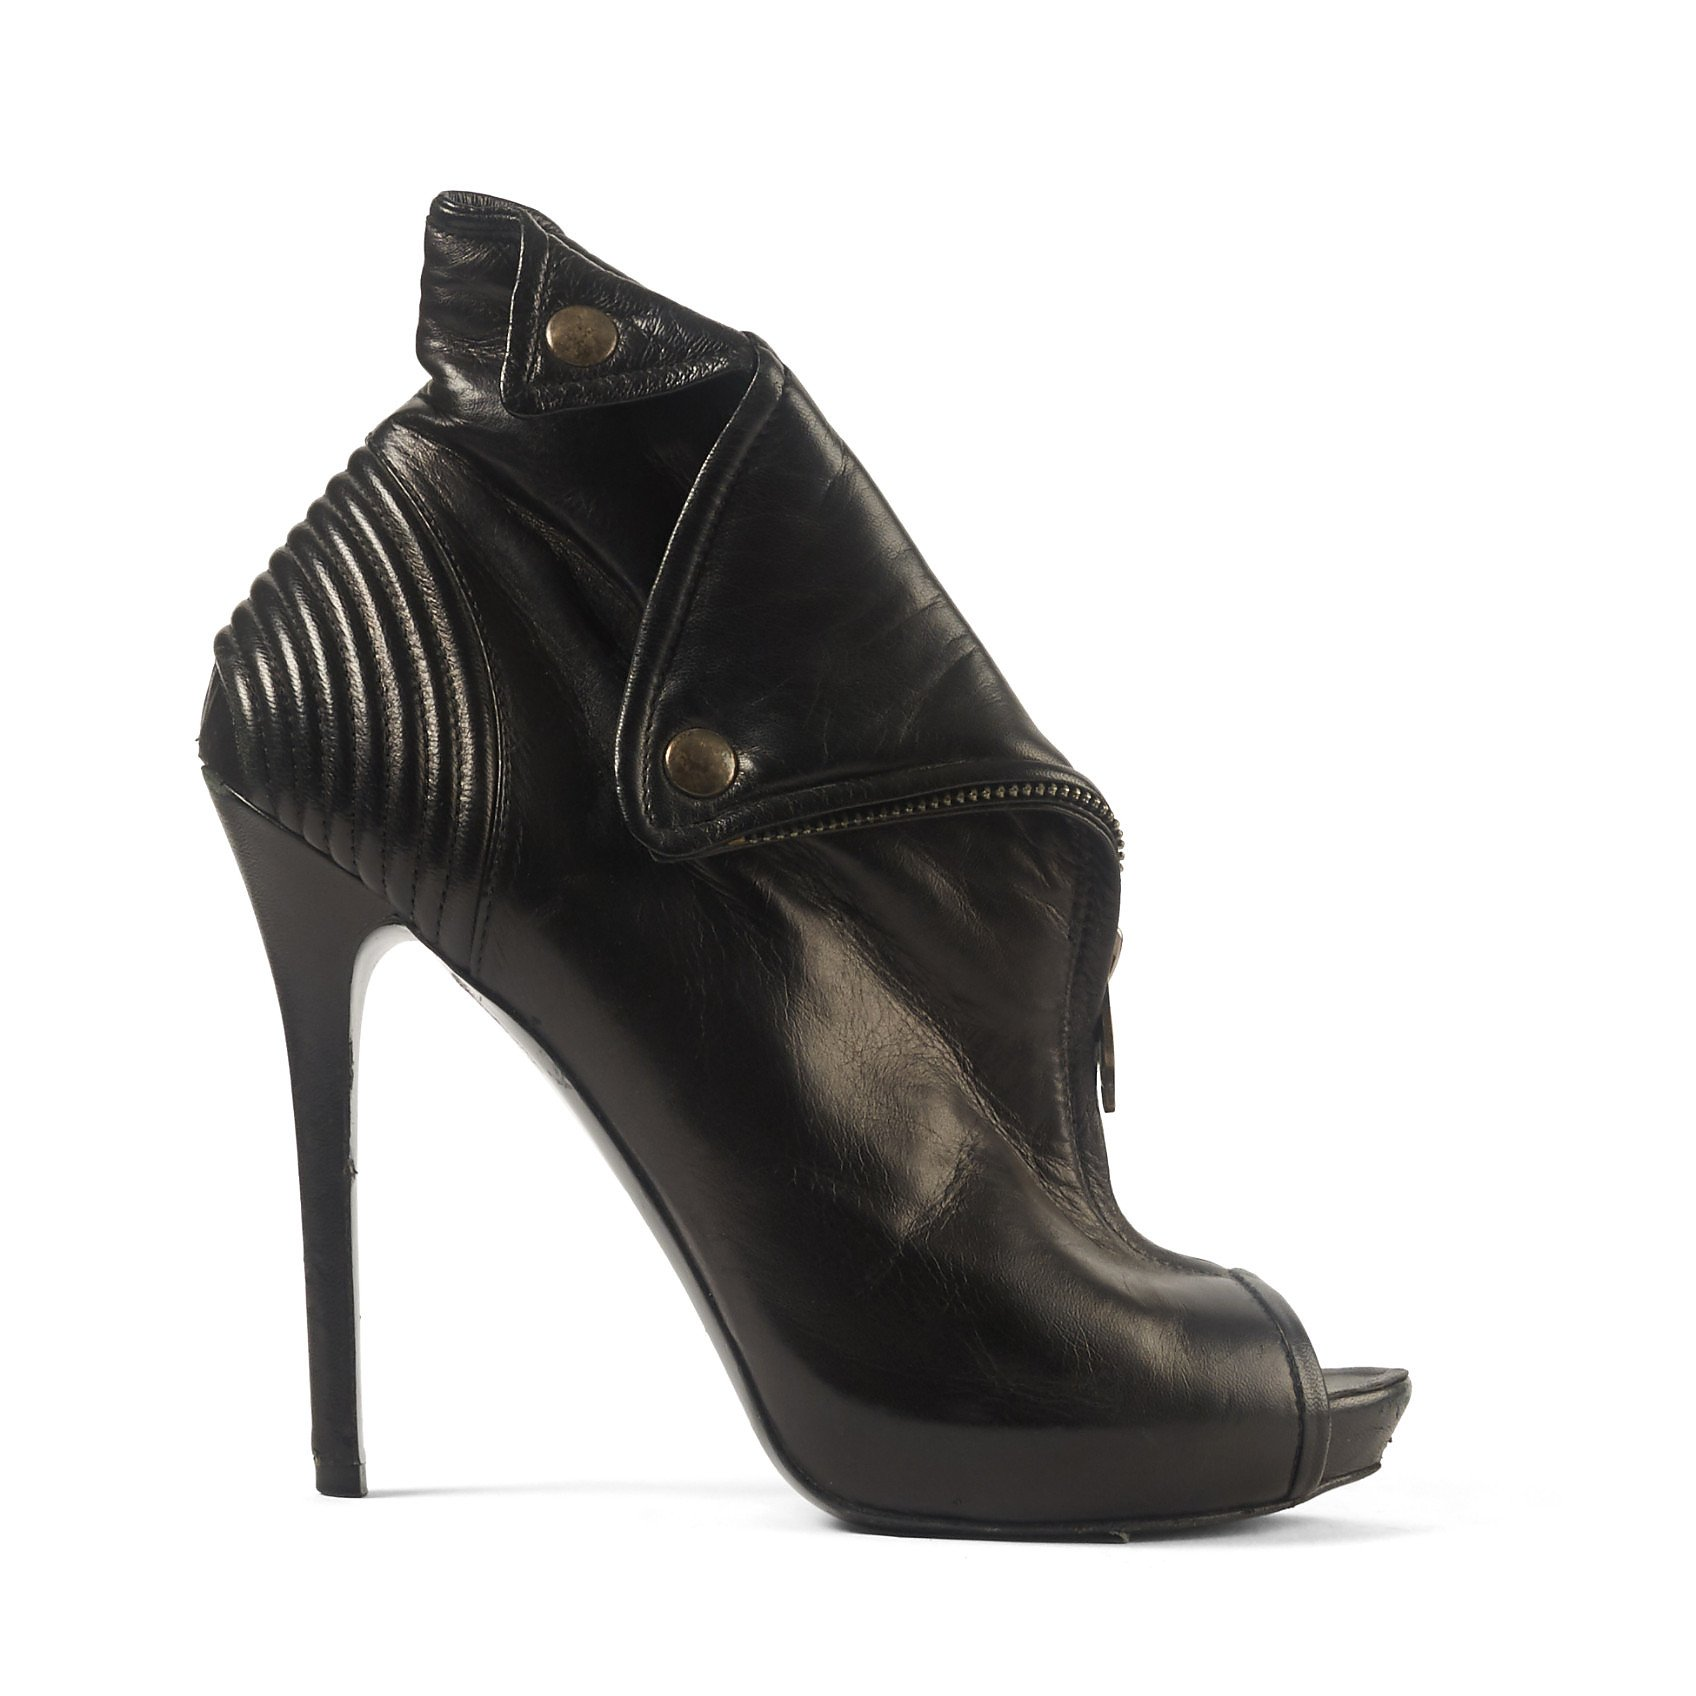 Alexander McQueen Peep Toe Ankle Boots